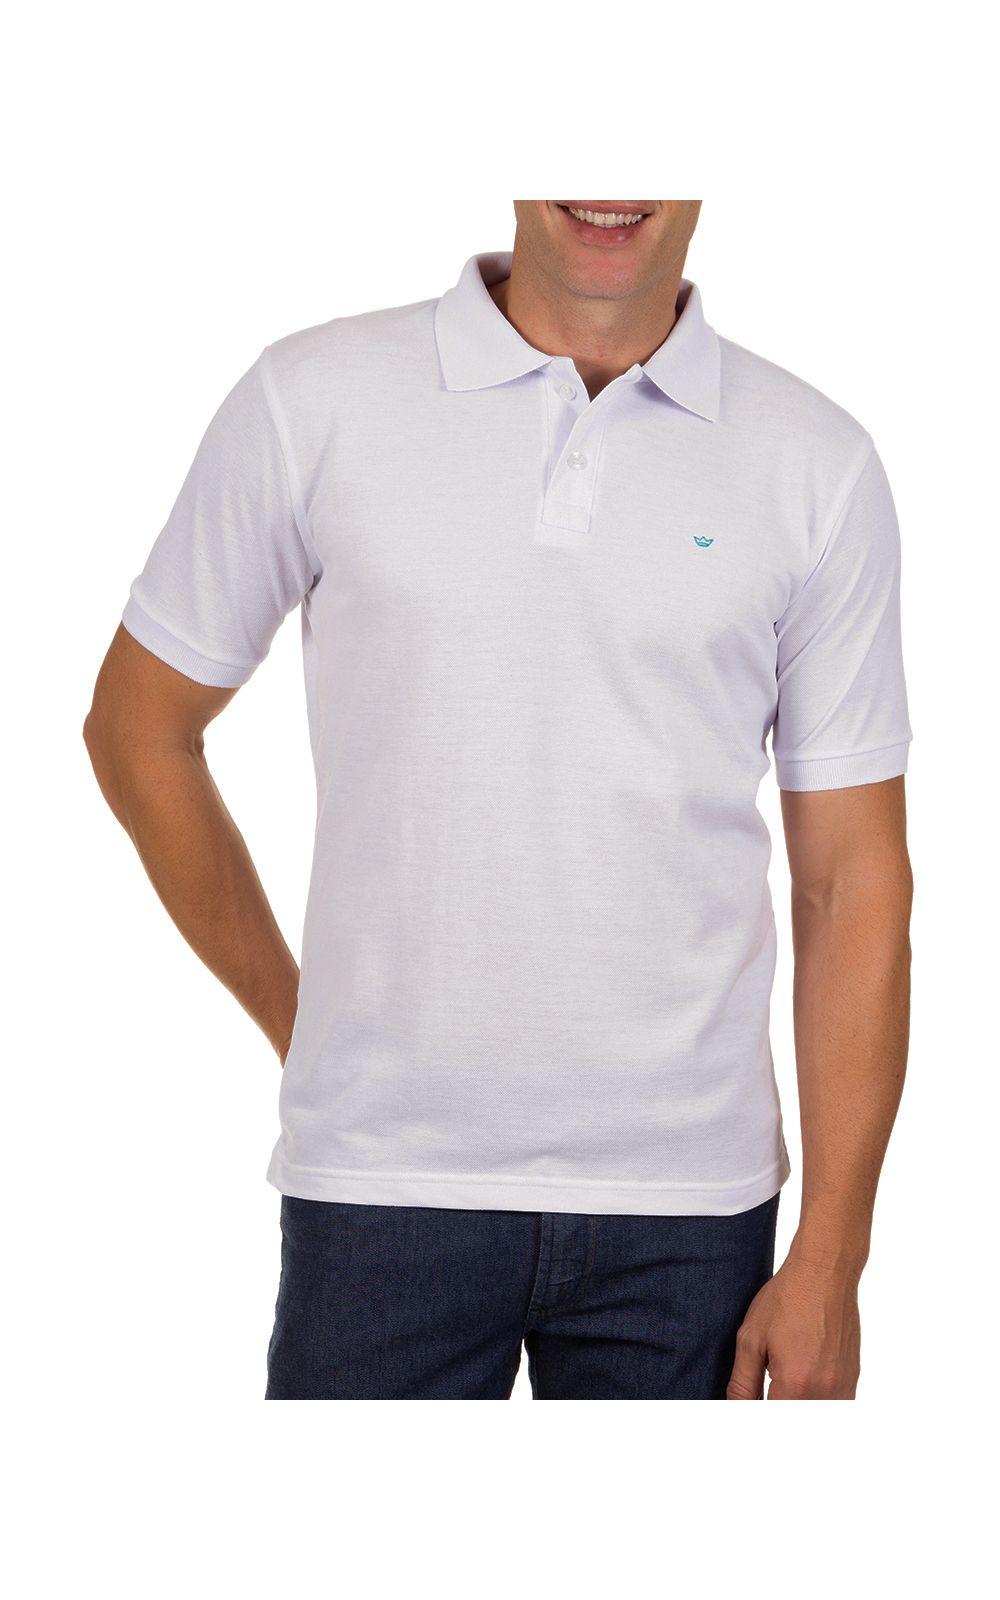 Foto 1 - Camisa Polo Masculina Branca Lisa